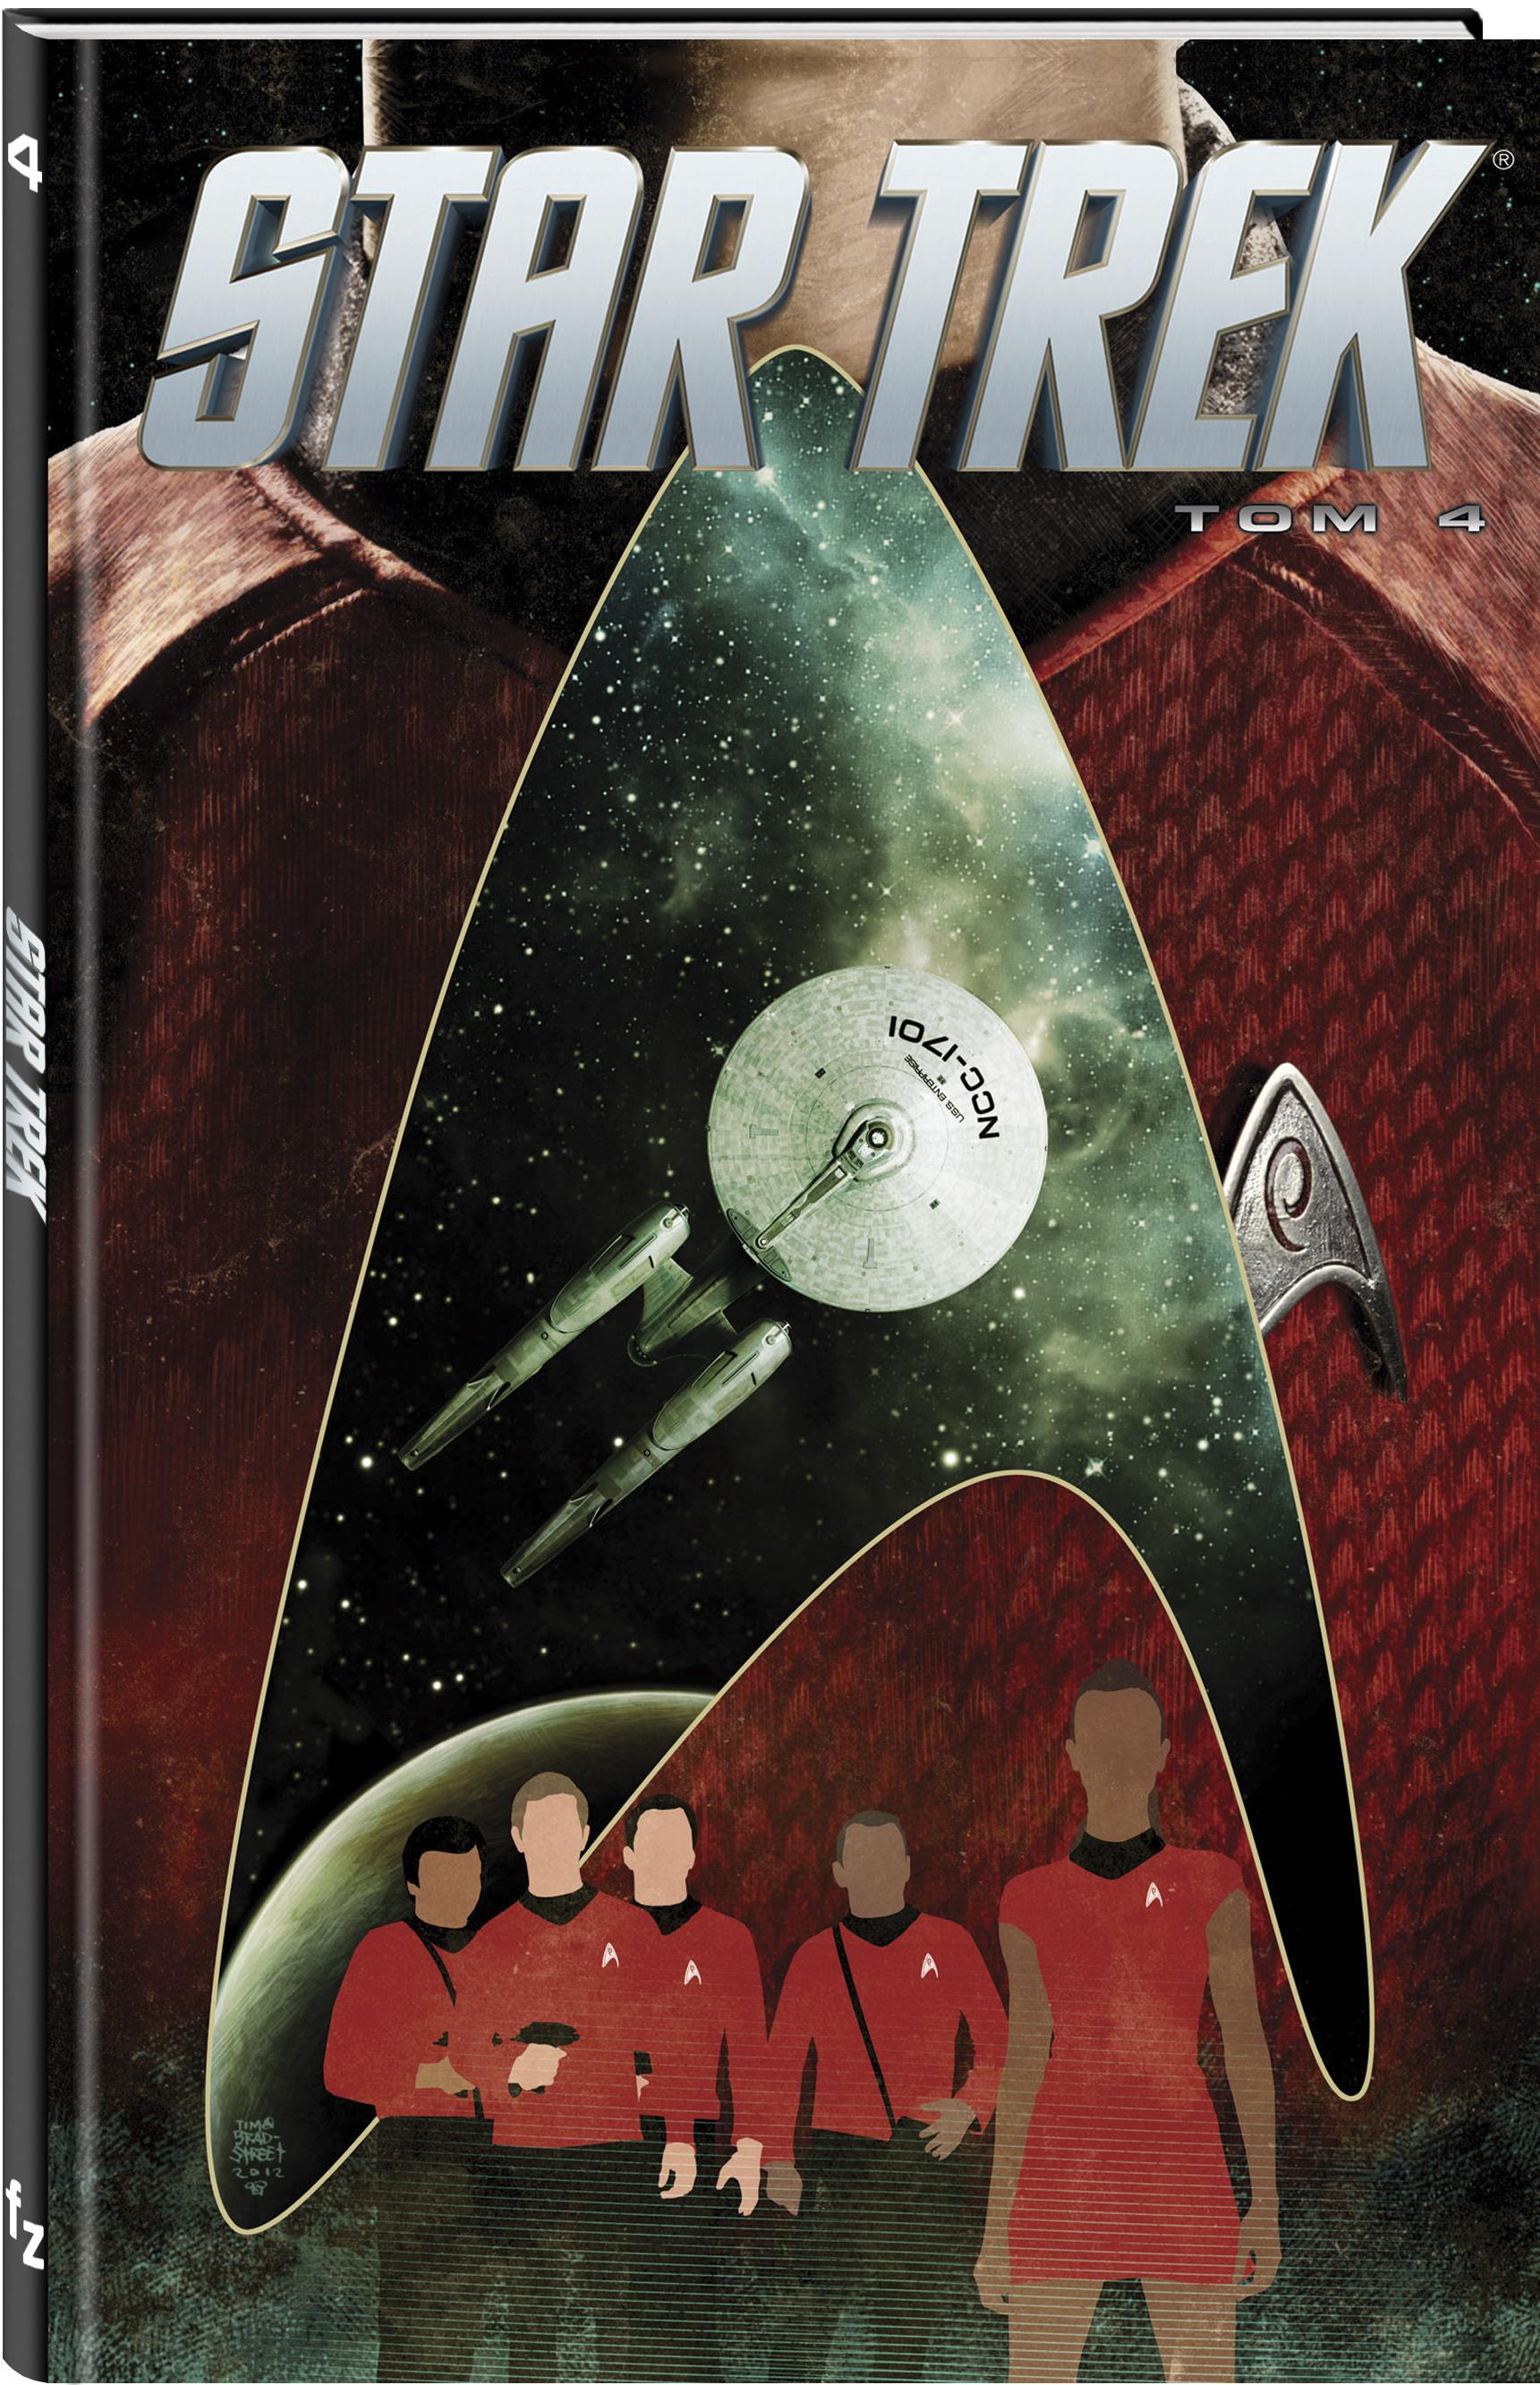 Фото - Джонсон М. Стартрек / Star Trek. Том 4 амбьернсен ингвар самсон и роберто крутые ребята